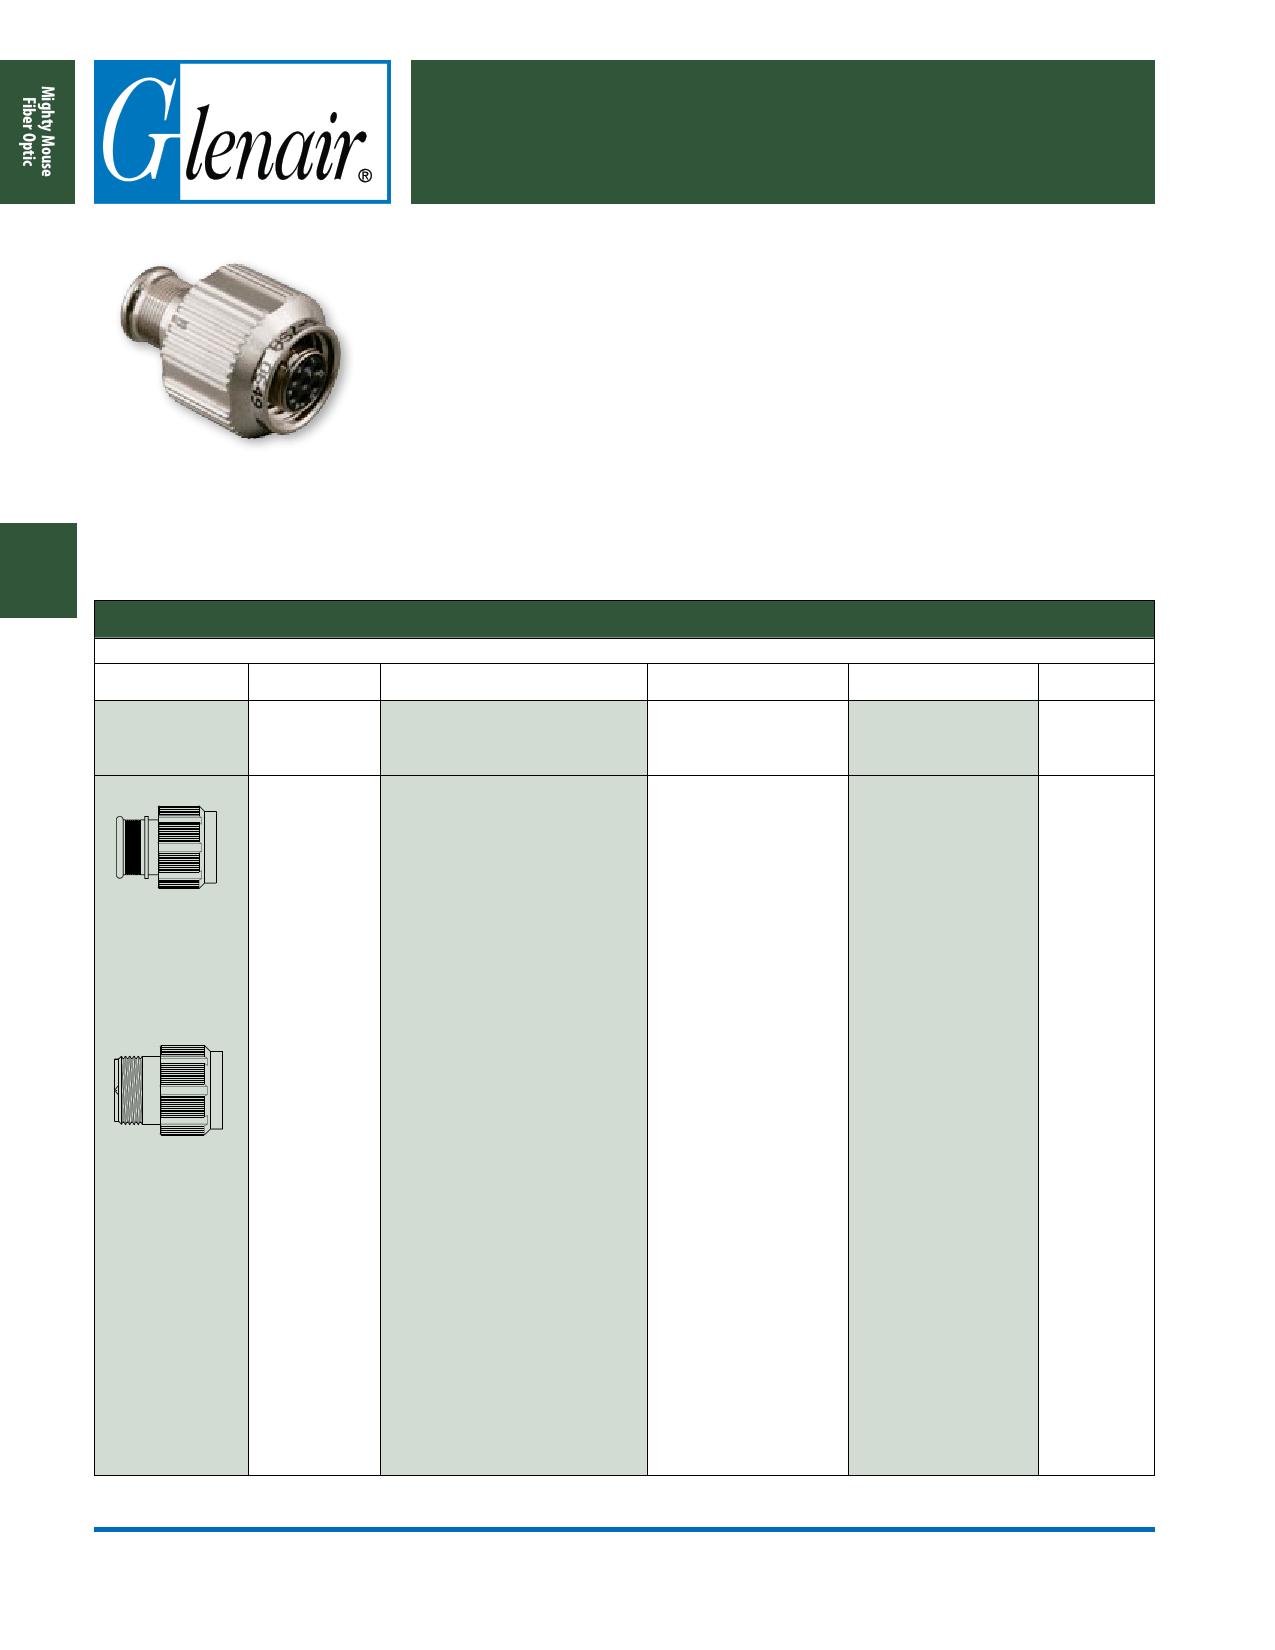 801-007-26xxxx datasheet